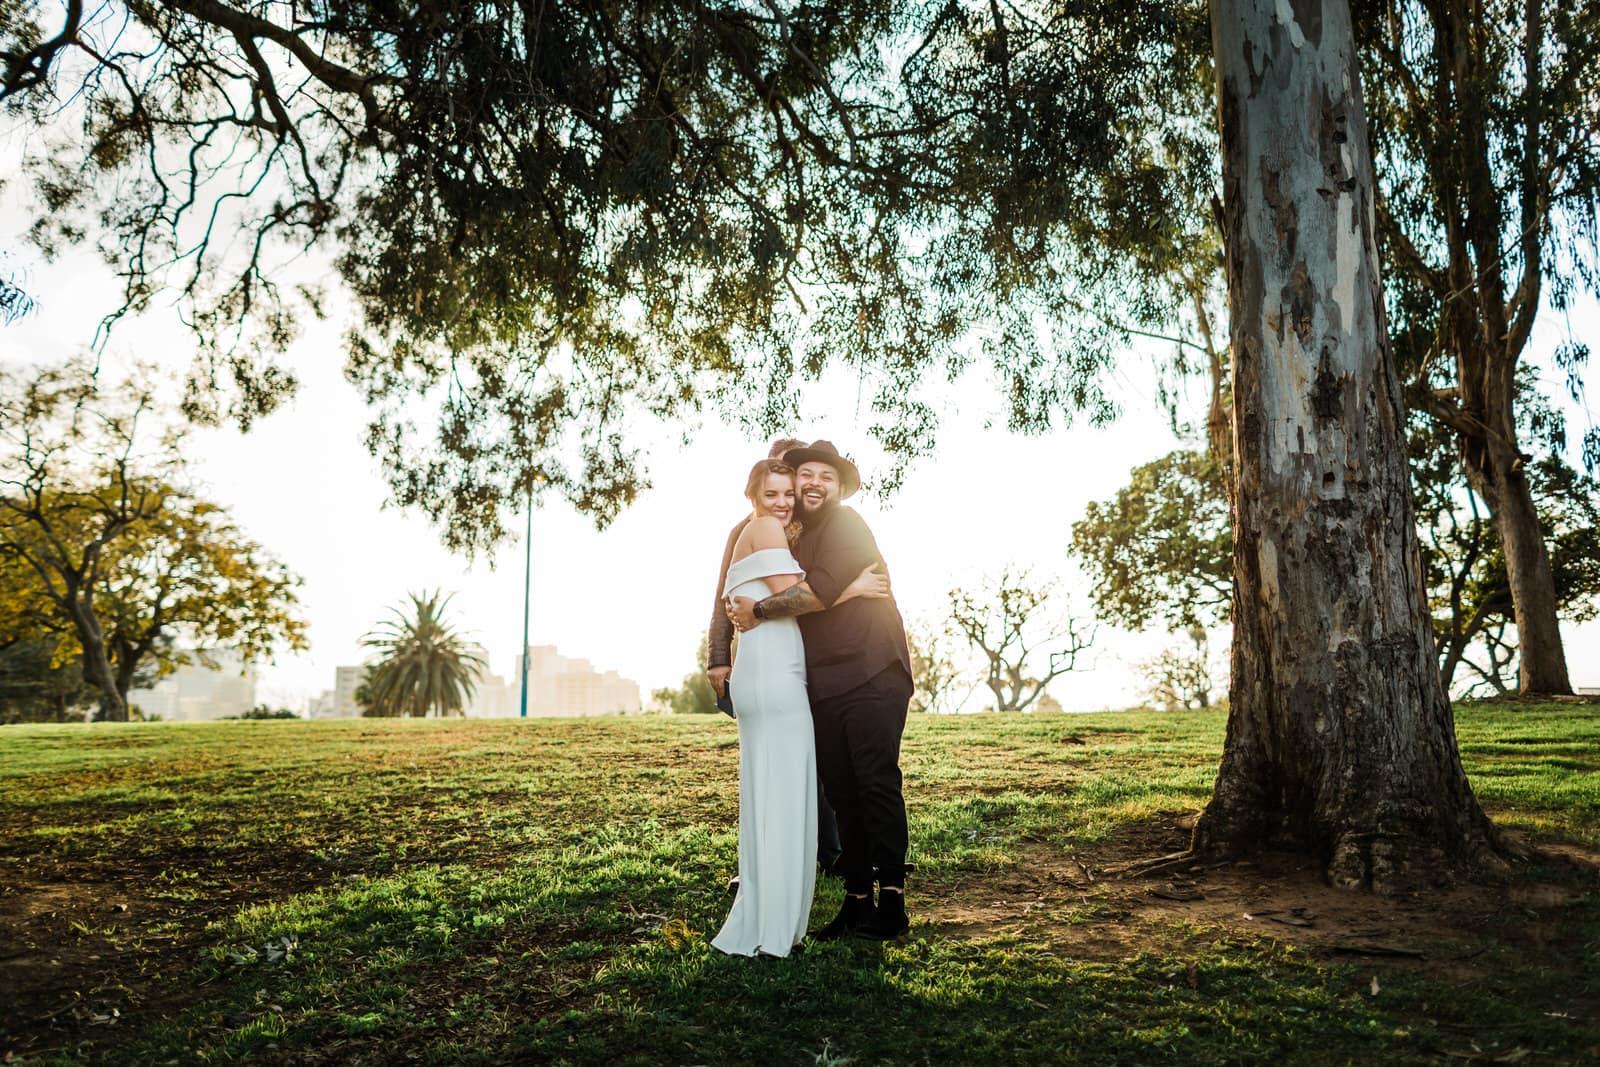 San Diego Elopement how to elope Microweddings minimony